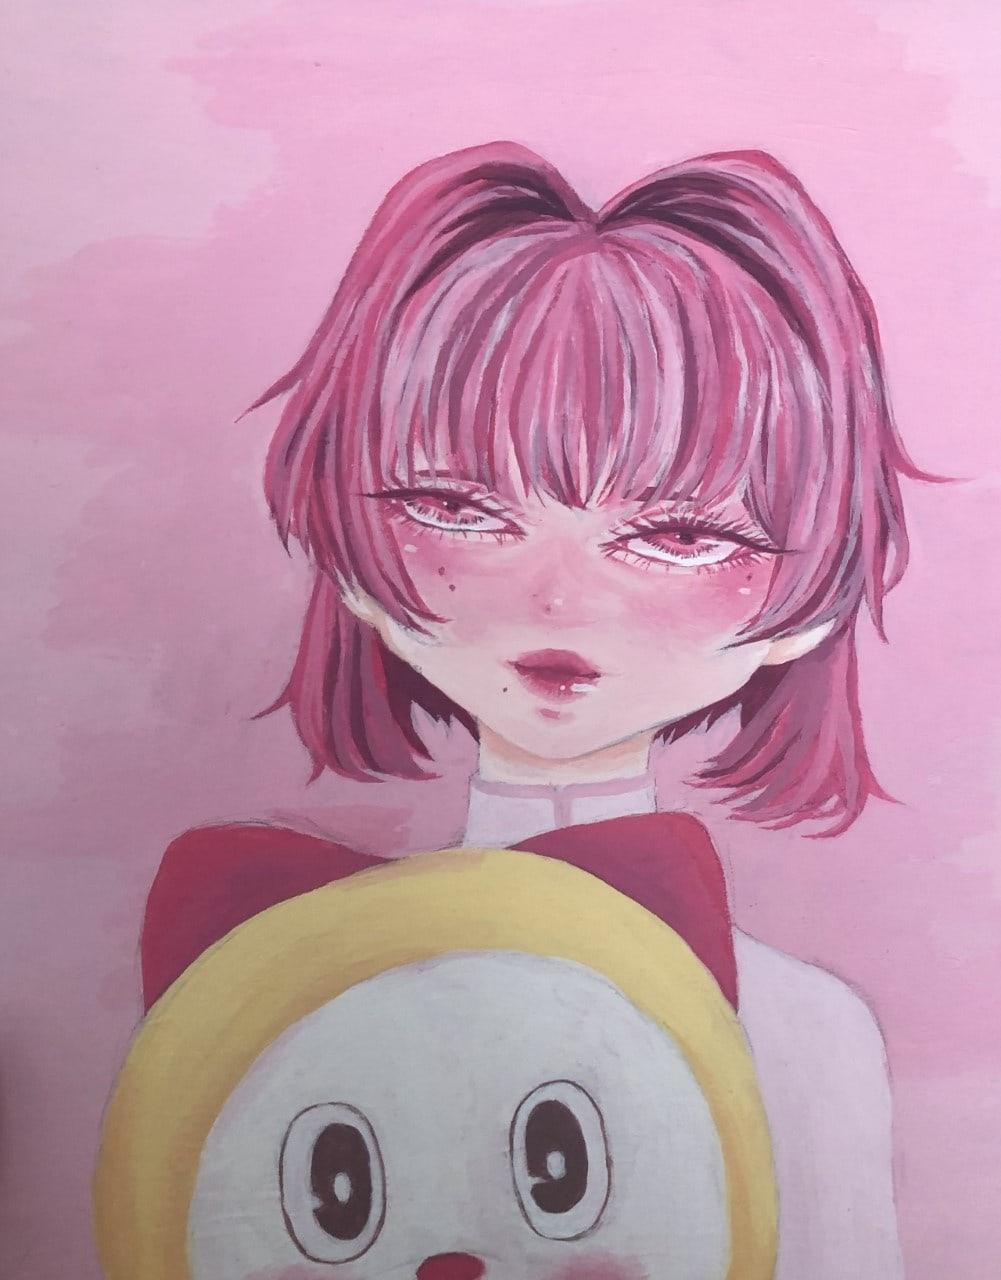 Katie Dennis, age 16 Inspired by Yoshitomo Nara